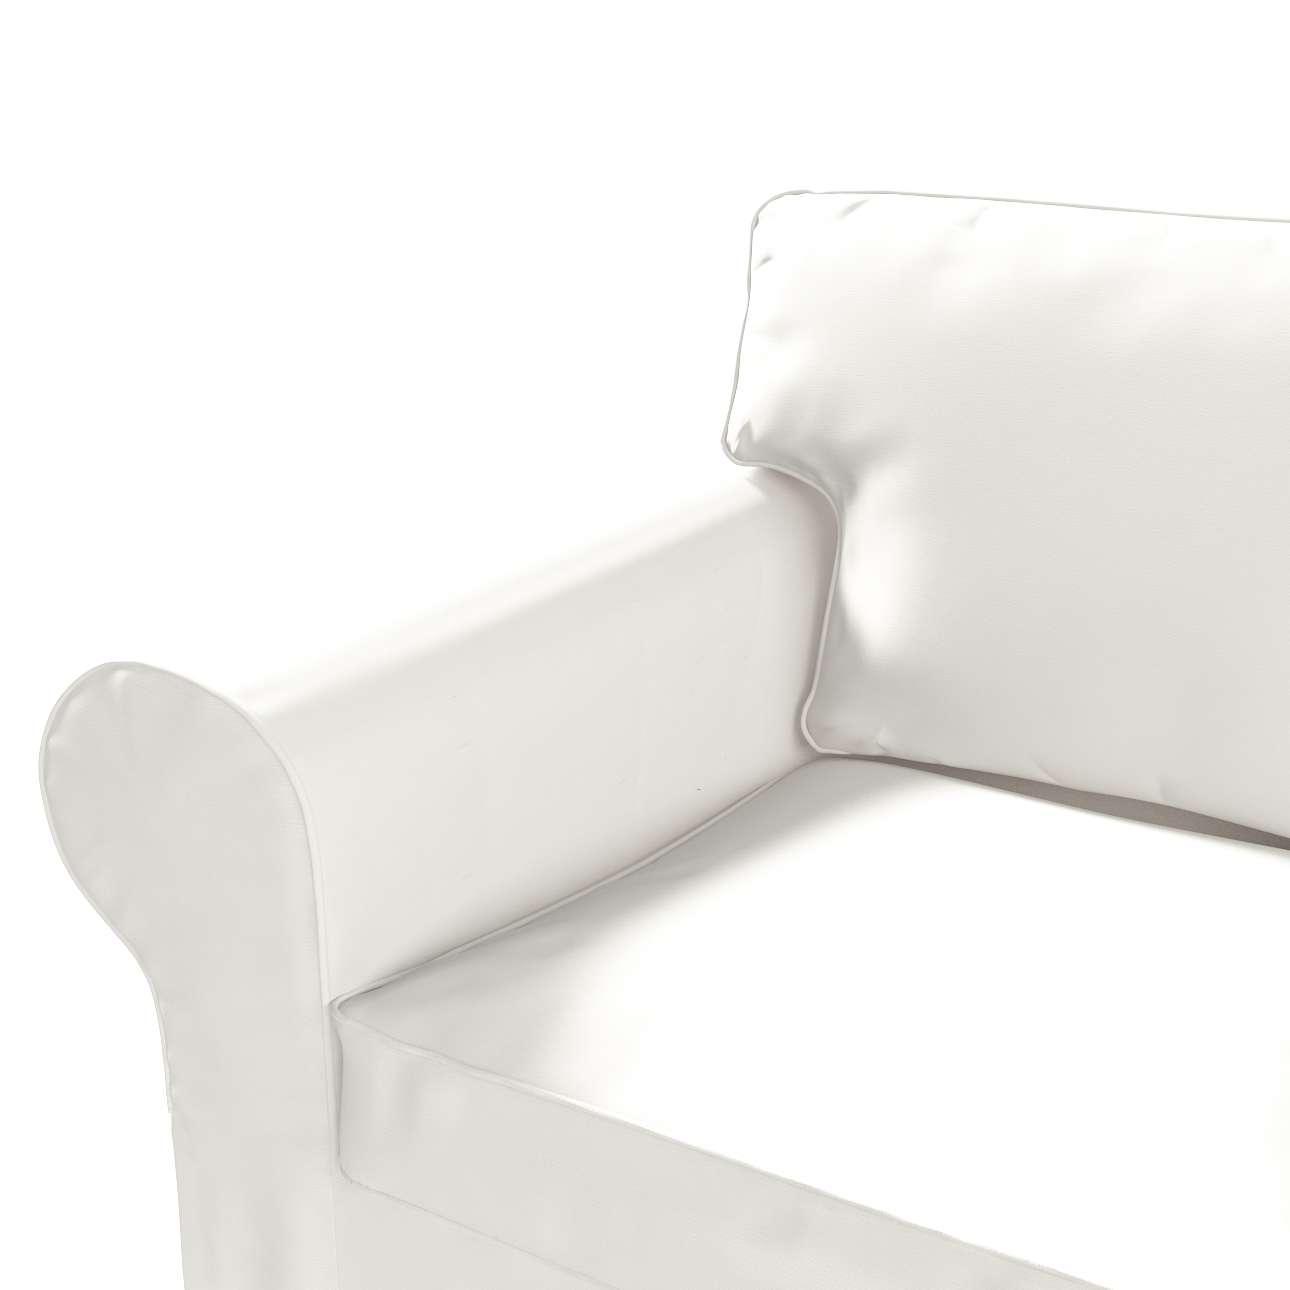 Ektorp 2-Sitzer Sofabezug nicht ausklappbar Sofabezug für  Ektorp 2-Sitzer nicht ausklappbar von der Kollektion Cotton Panama, Stoff: 702-34